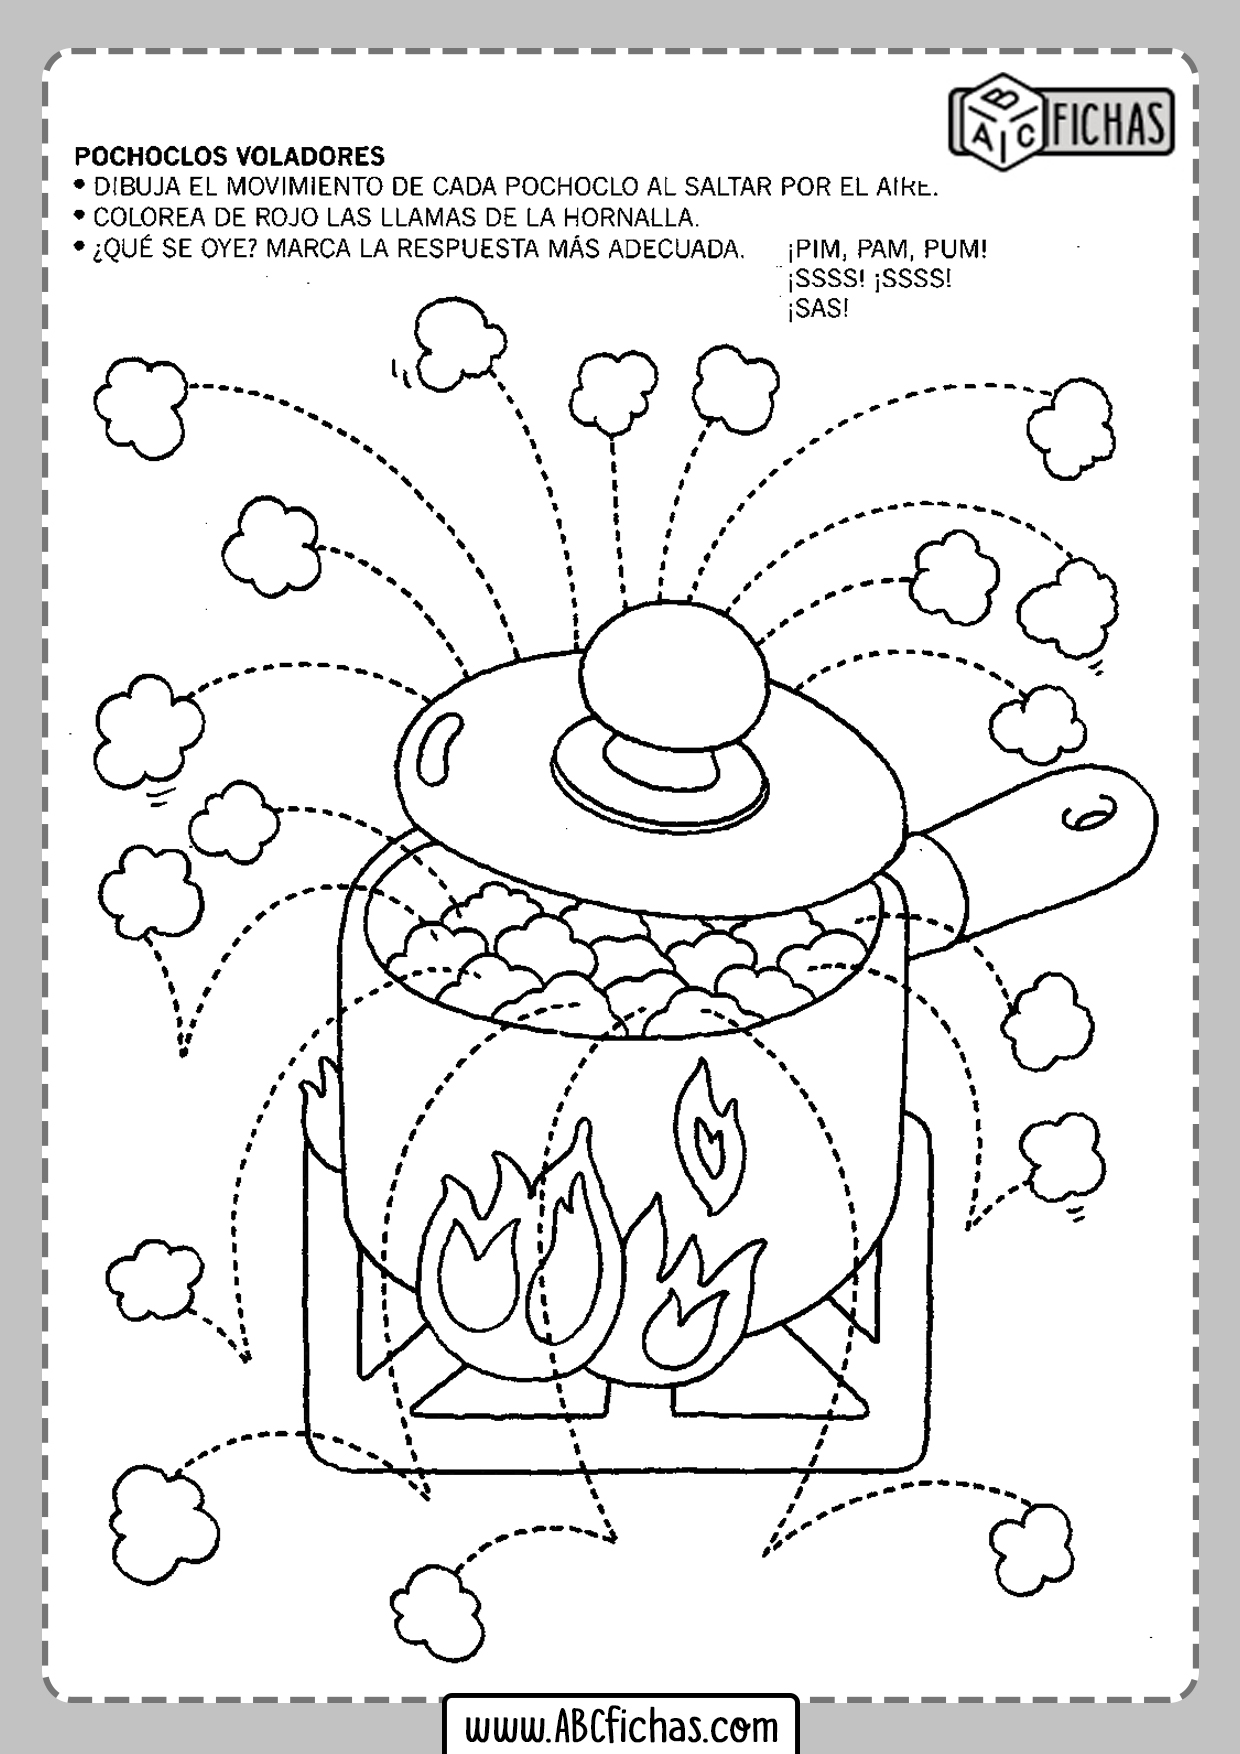 Fichas para imprimir para niños